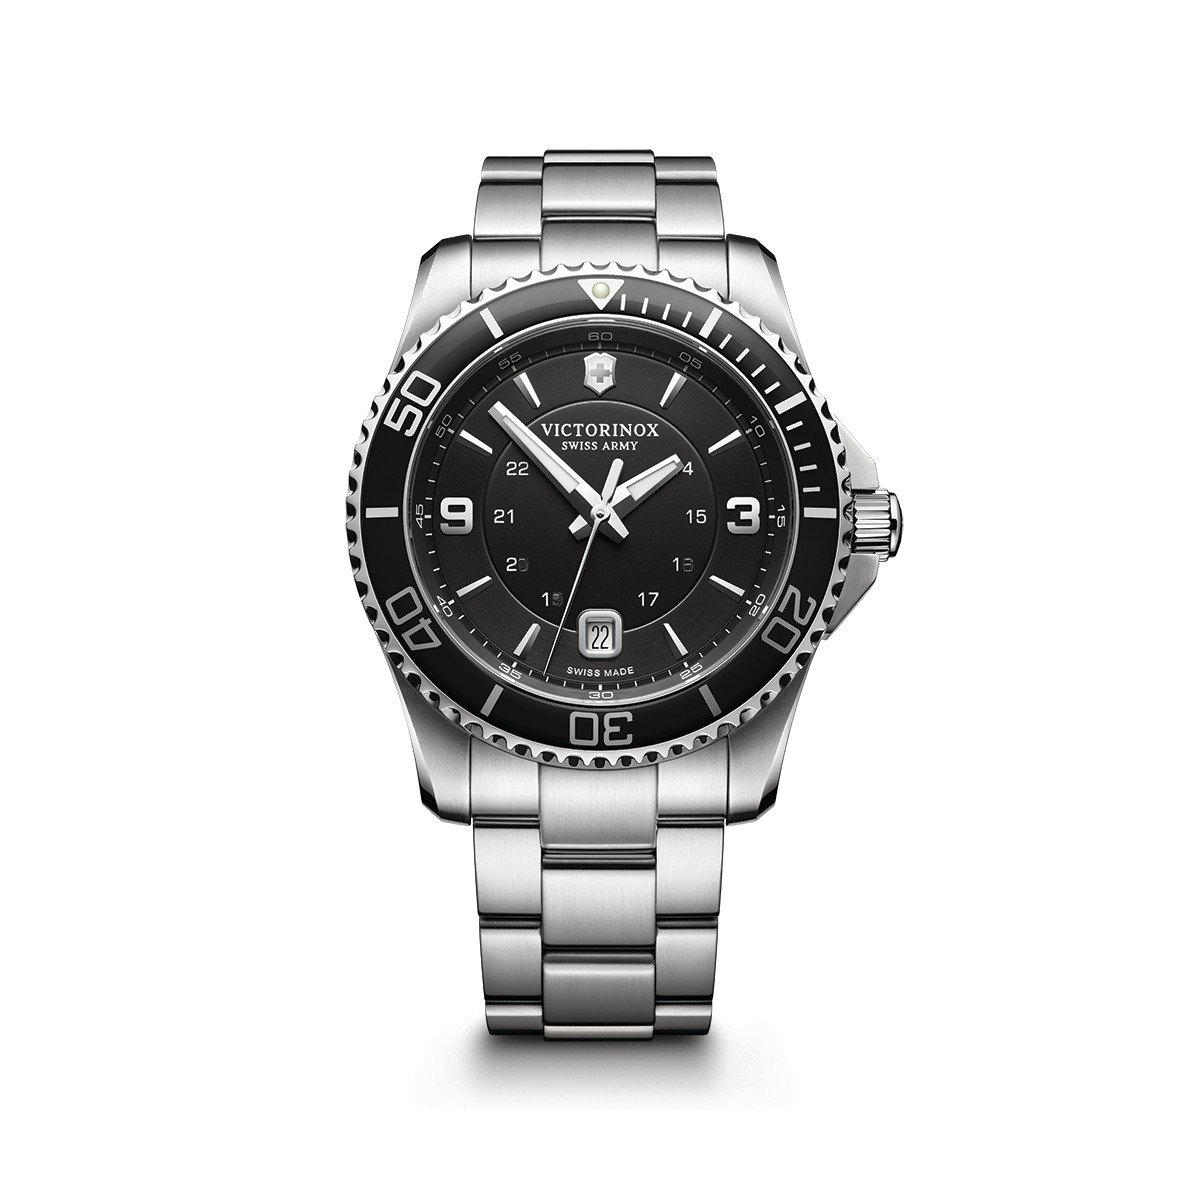 Victorinox Swiss Army Men's Watch 241697